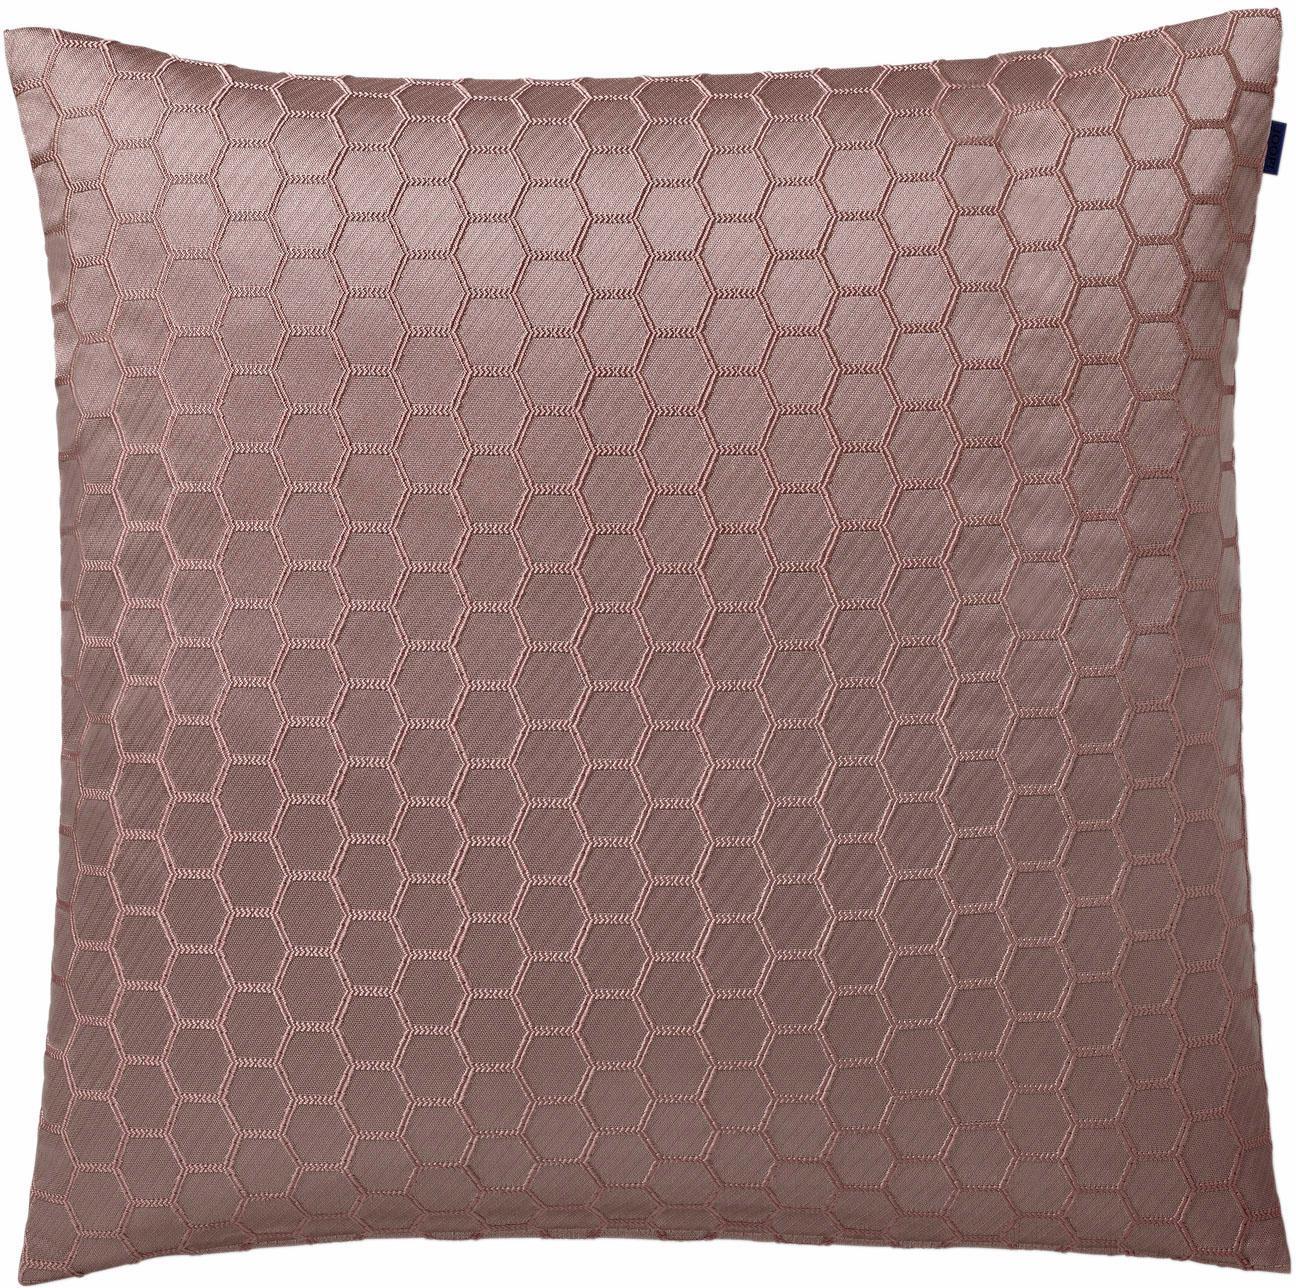 Kissenbezug Hexagon Joop!